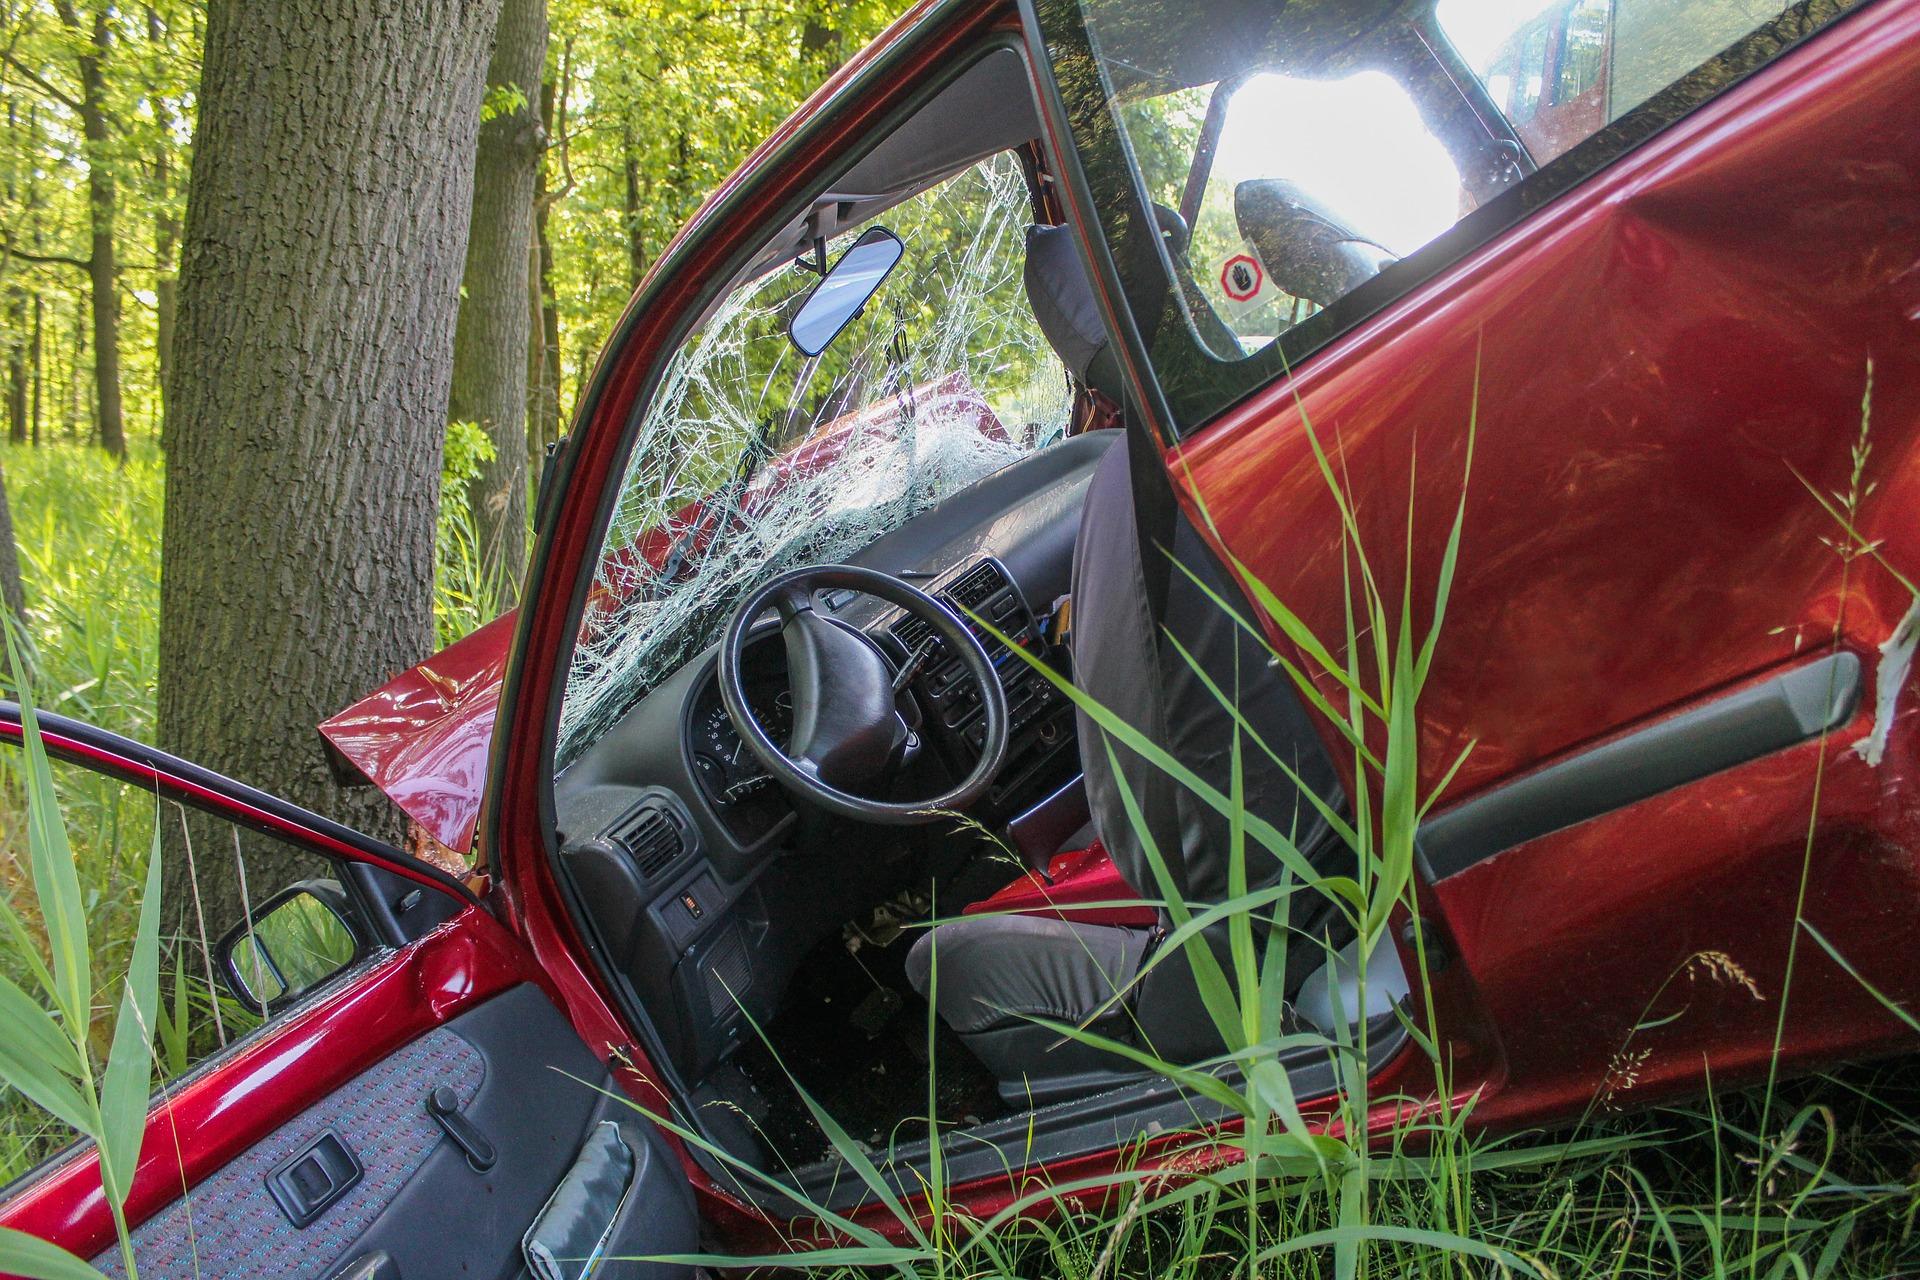 autobaleset-gyorshajtas.jpg